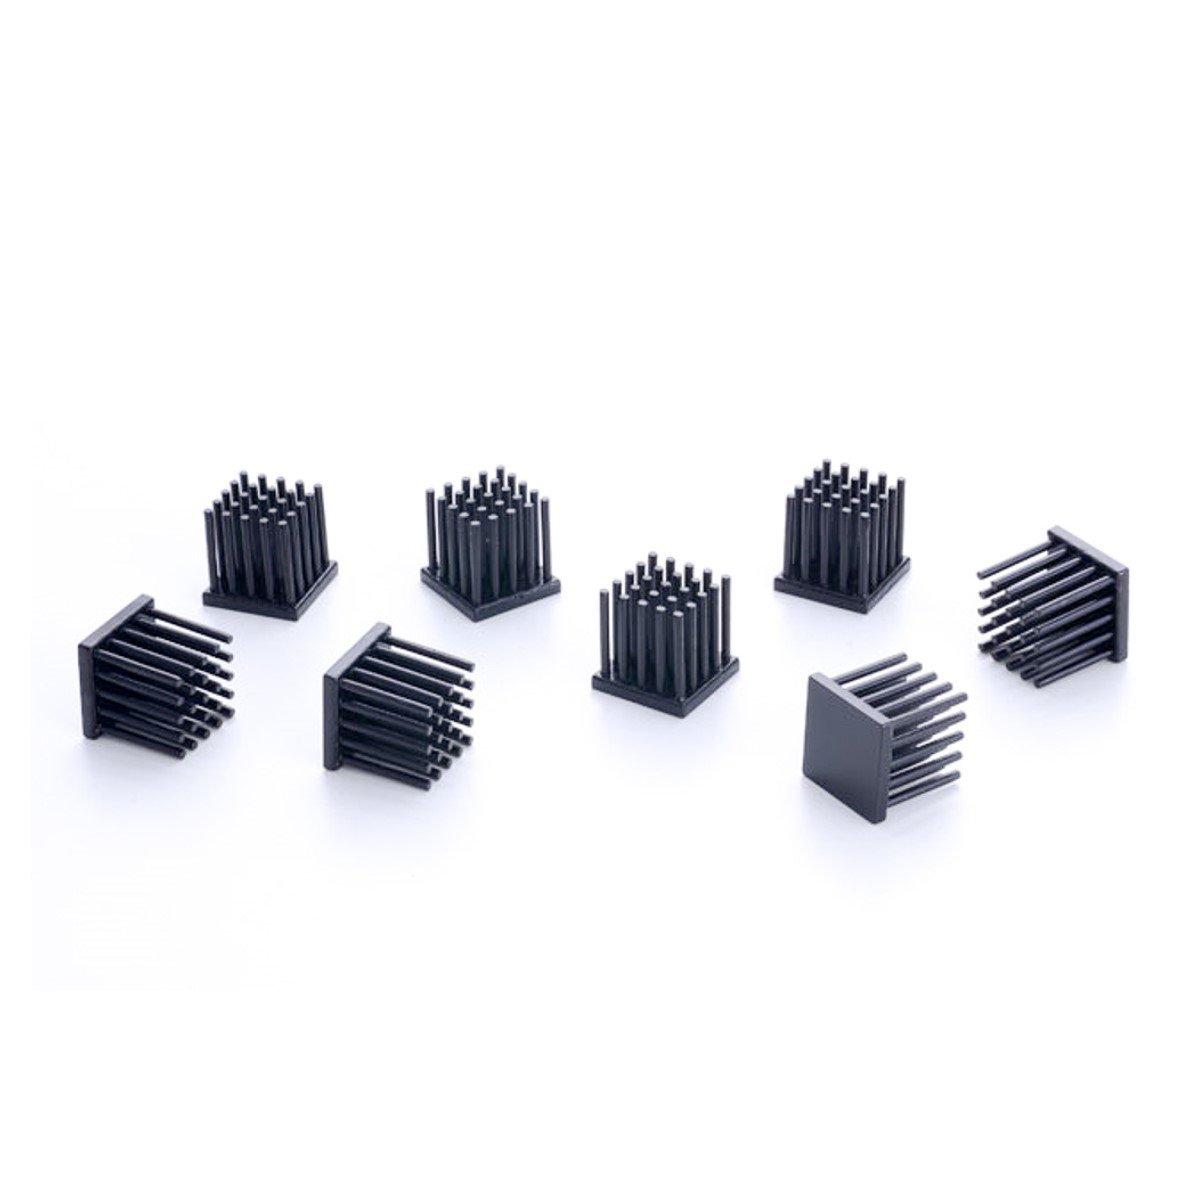 Enzotech BMR-C1-LE Memory Ramsink (Black)